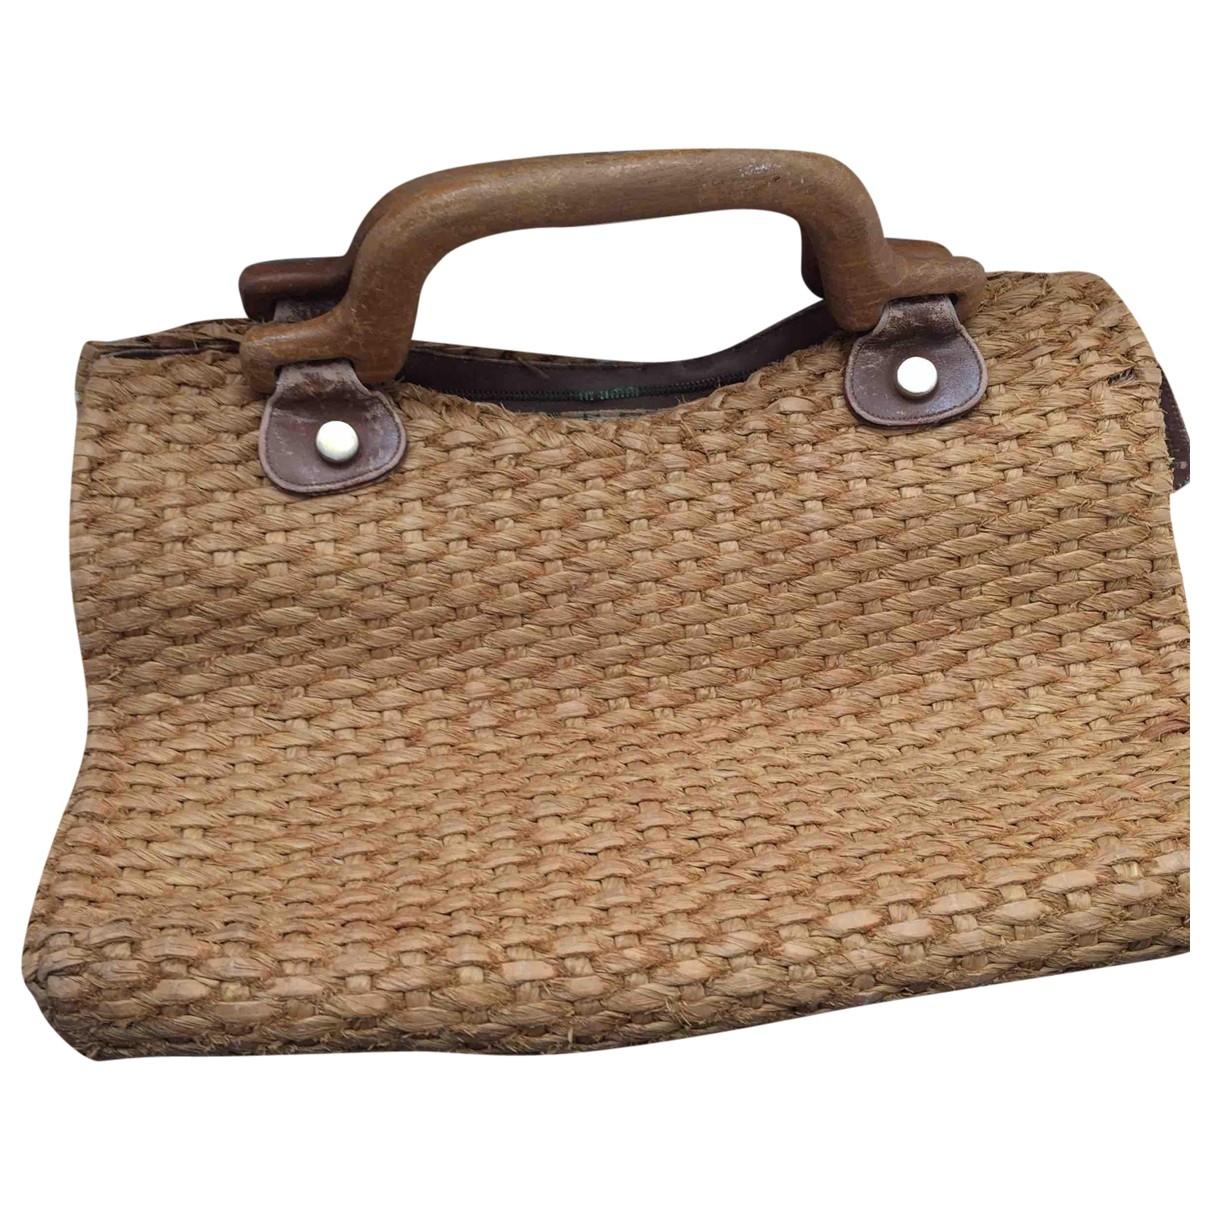 Salvatore Ferragamo \N Beige Wicker handbag for Women \N